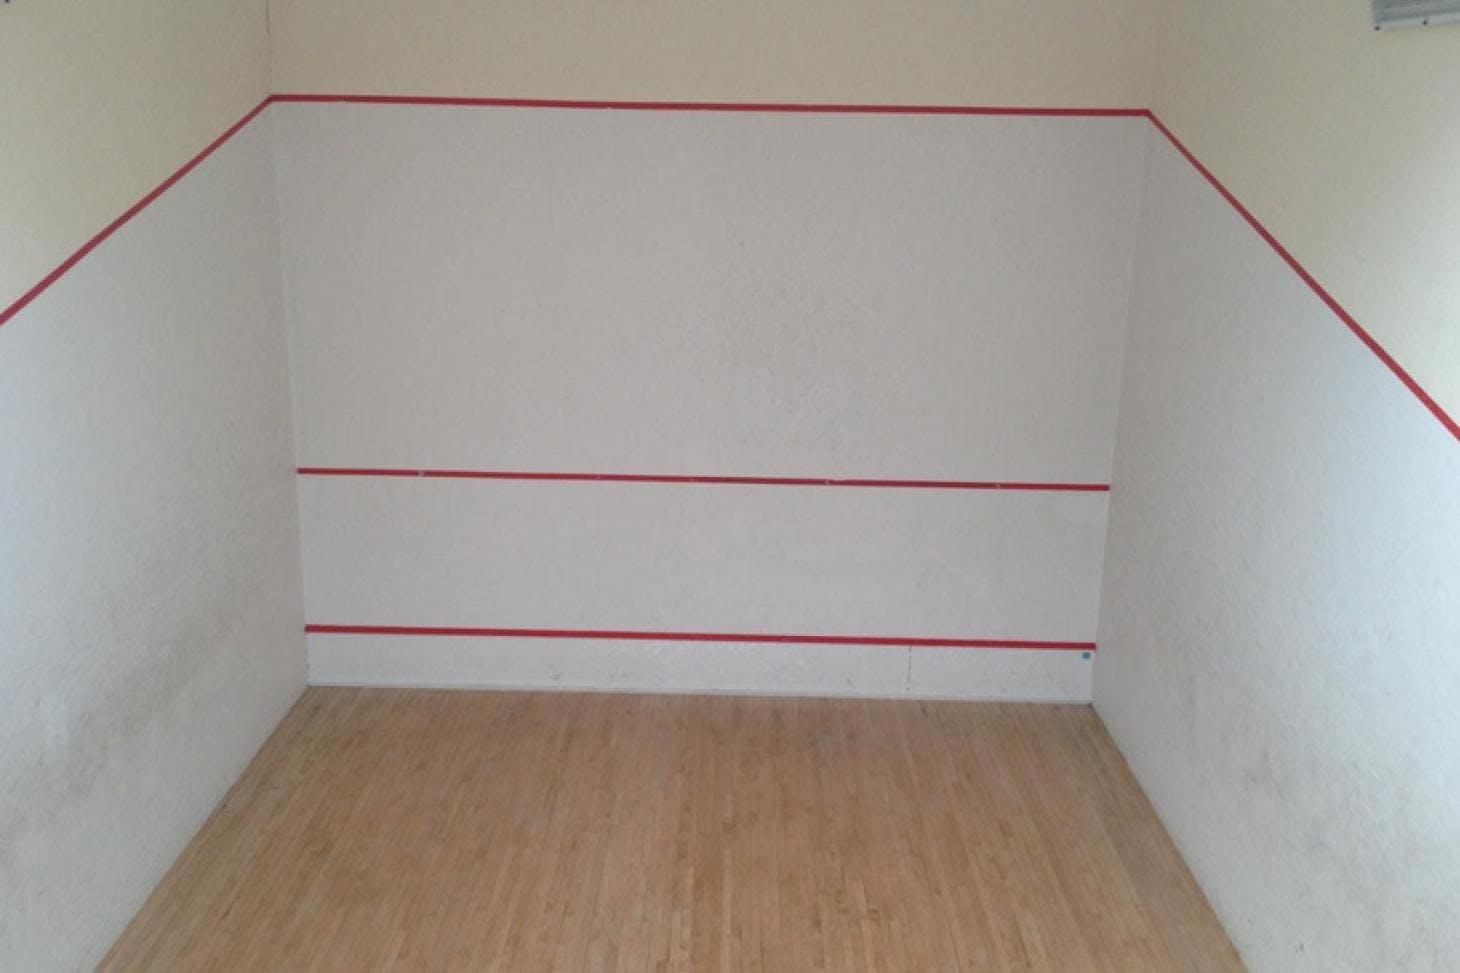 Robert Lowe Sports Centre Indoor | Hard squash court